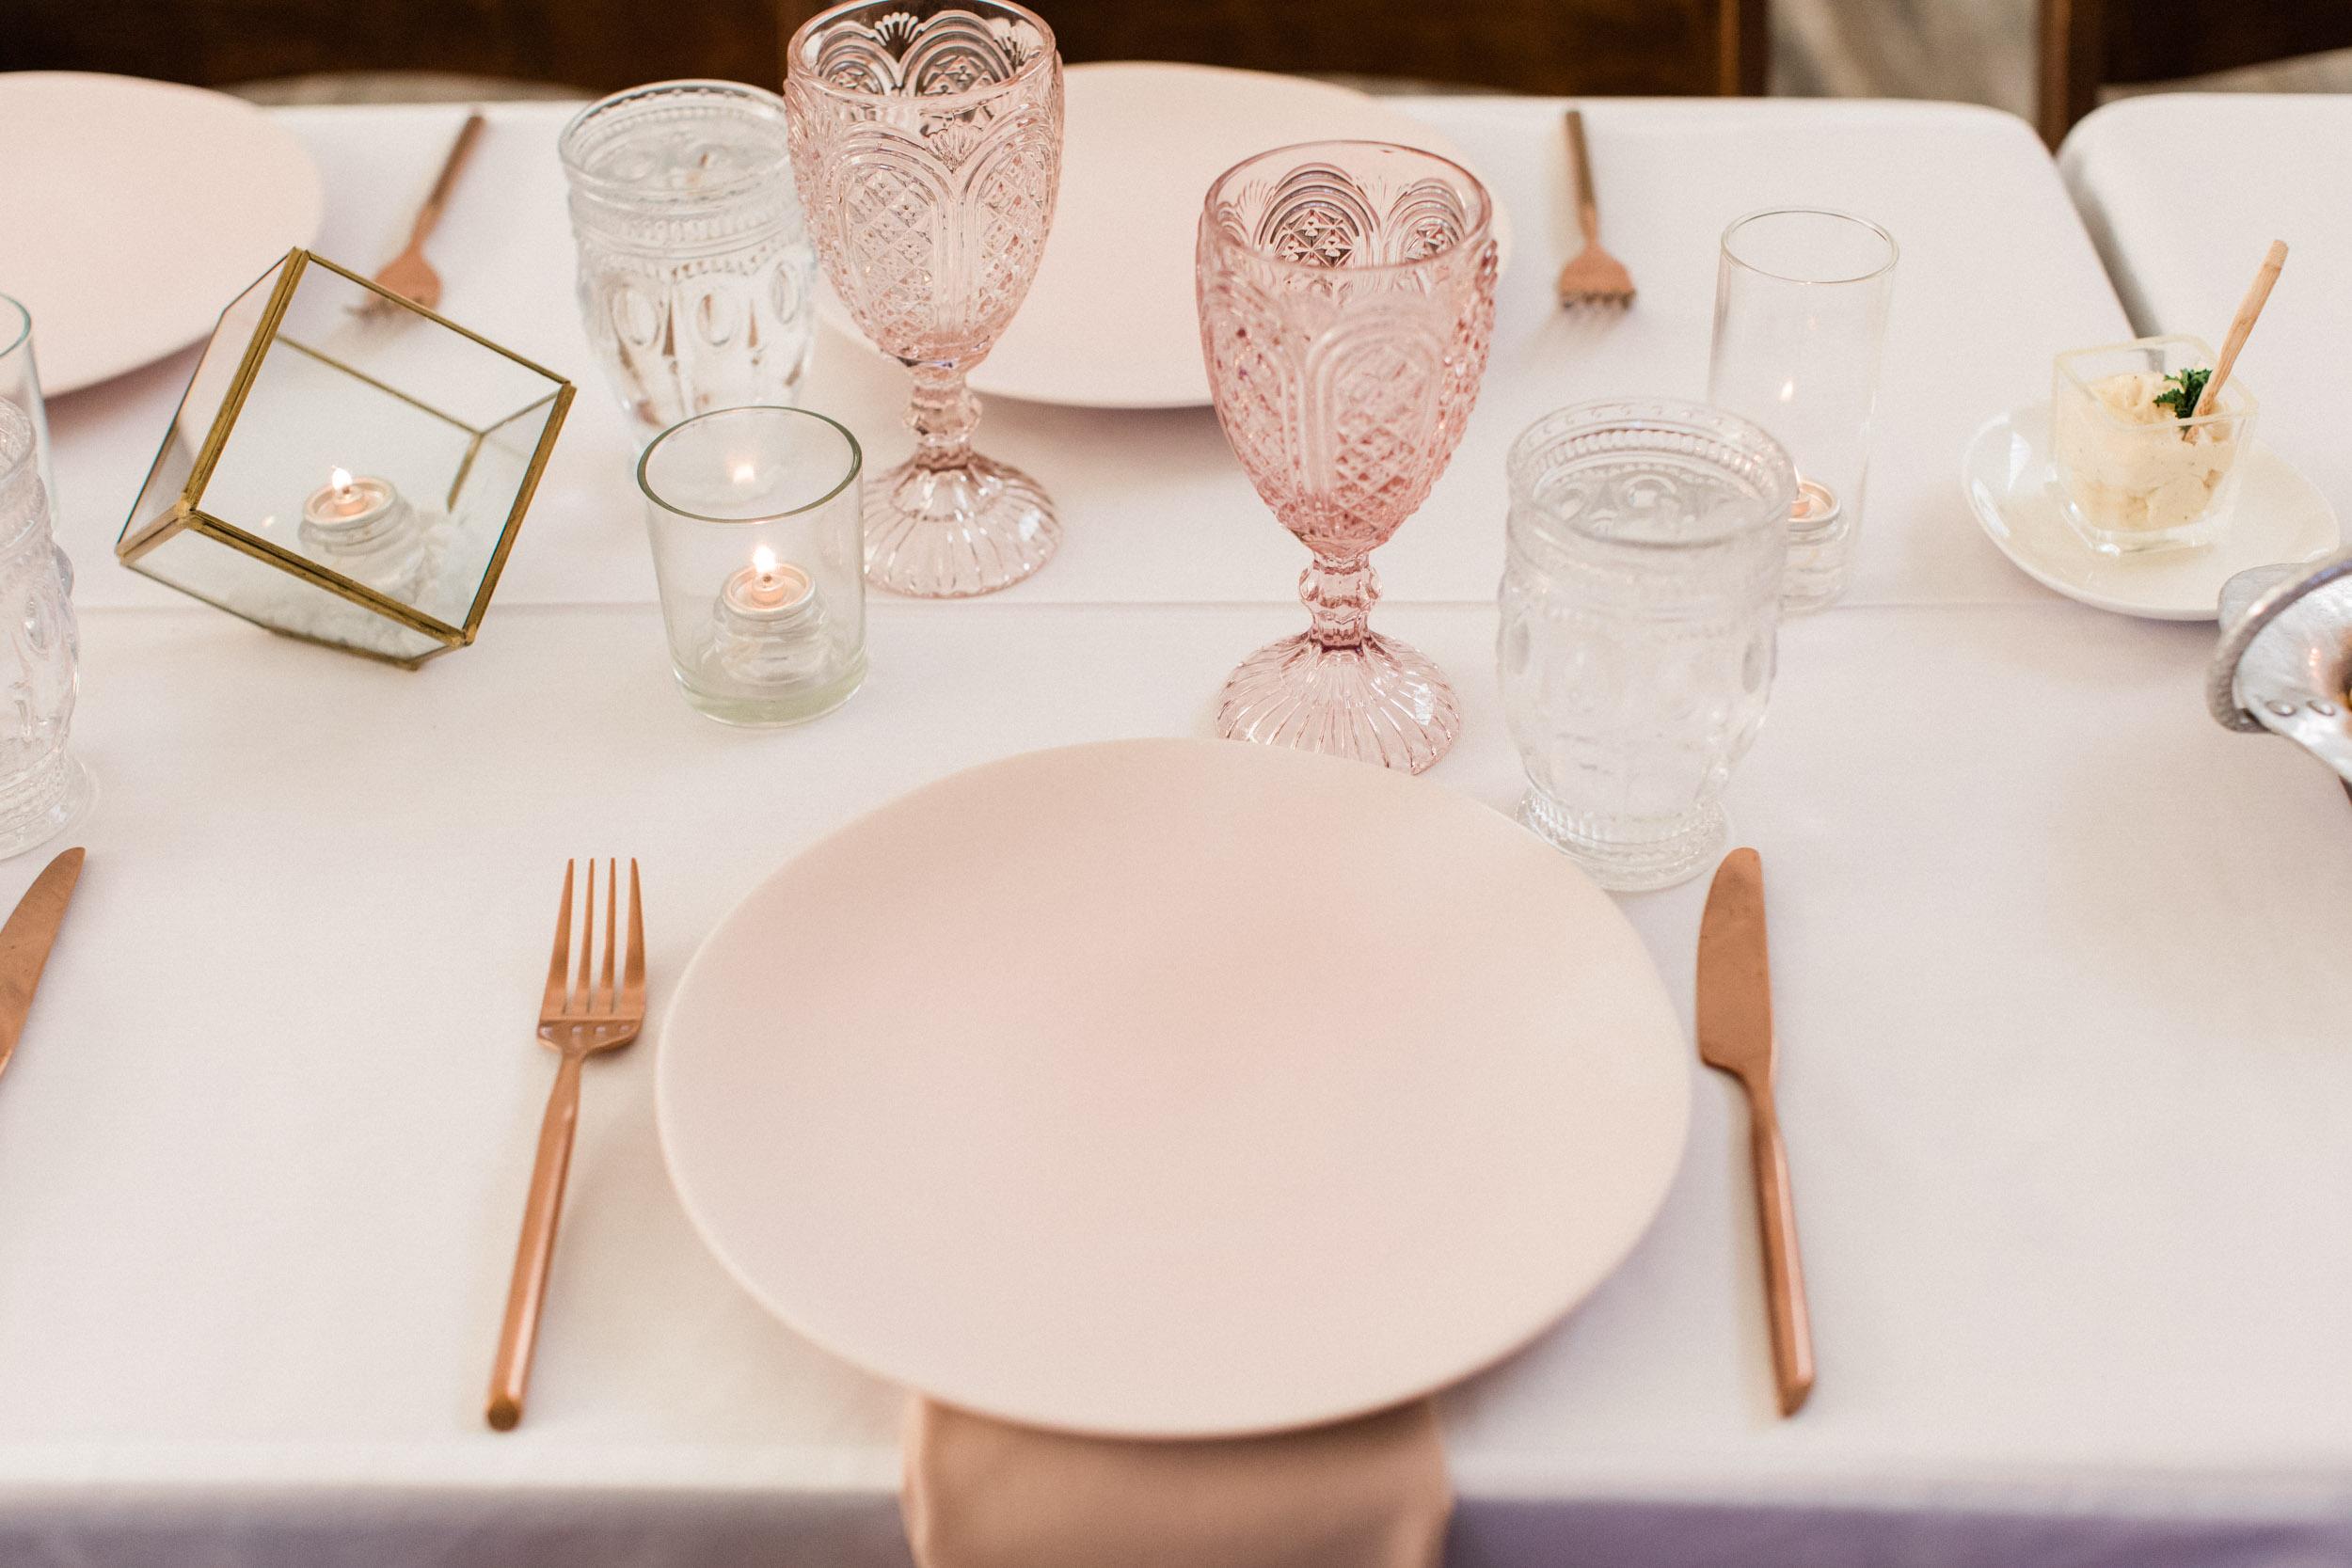 BKM-Photography-Los-Angeles-Highland-Park-York-Manor-Wedding-Photography-0929.jpg